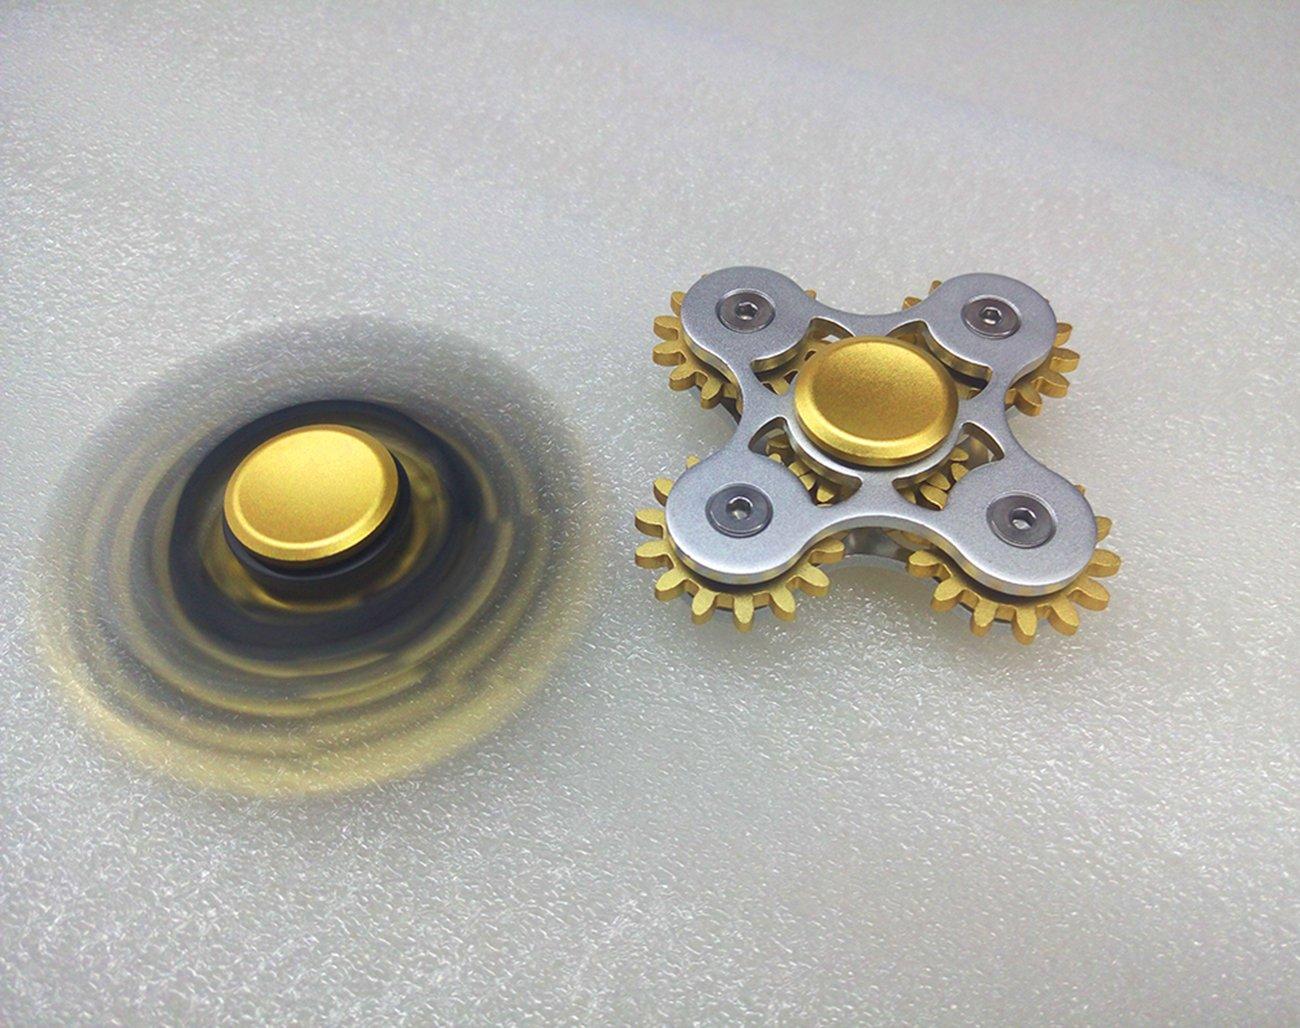 5 Gears Linkage Metal Fidget Hand Spinner Fast Rotation Luxury Stress Relief Toy(Nickel)